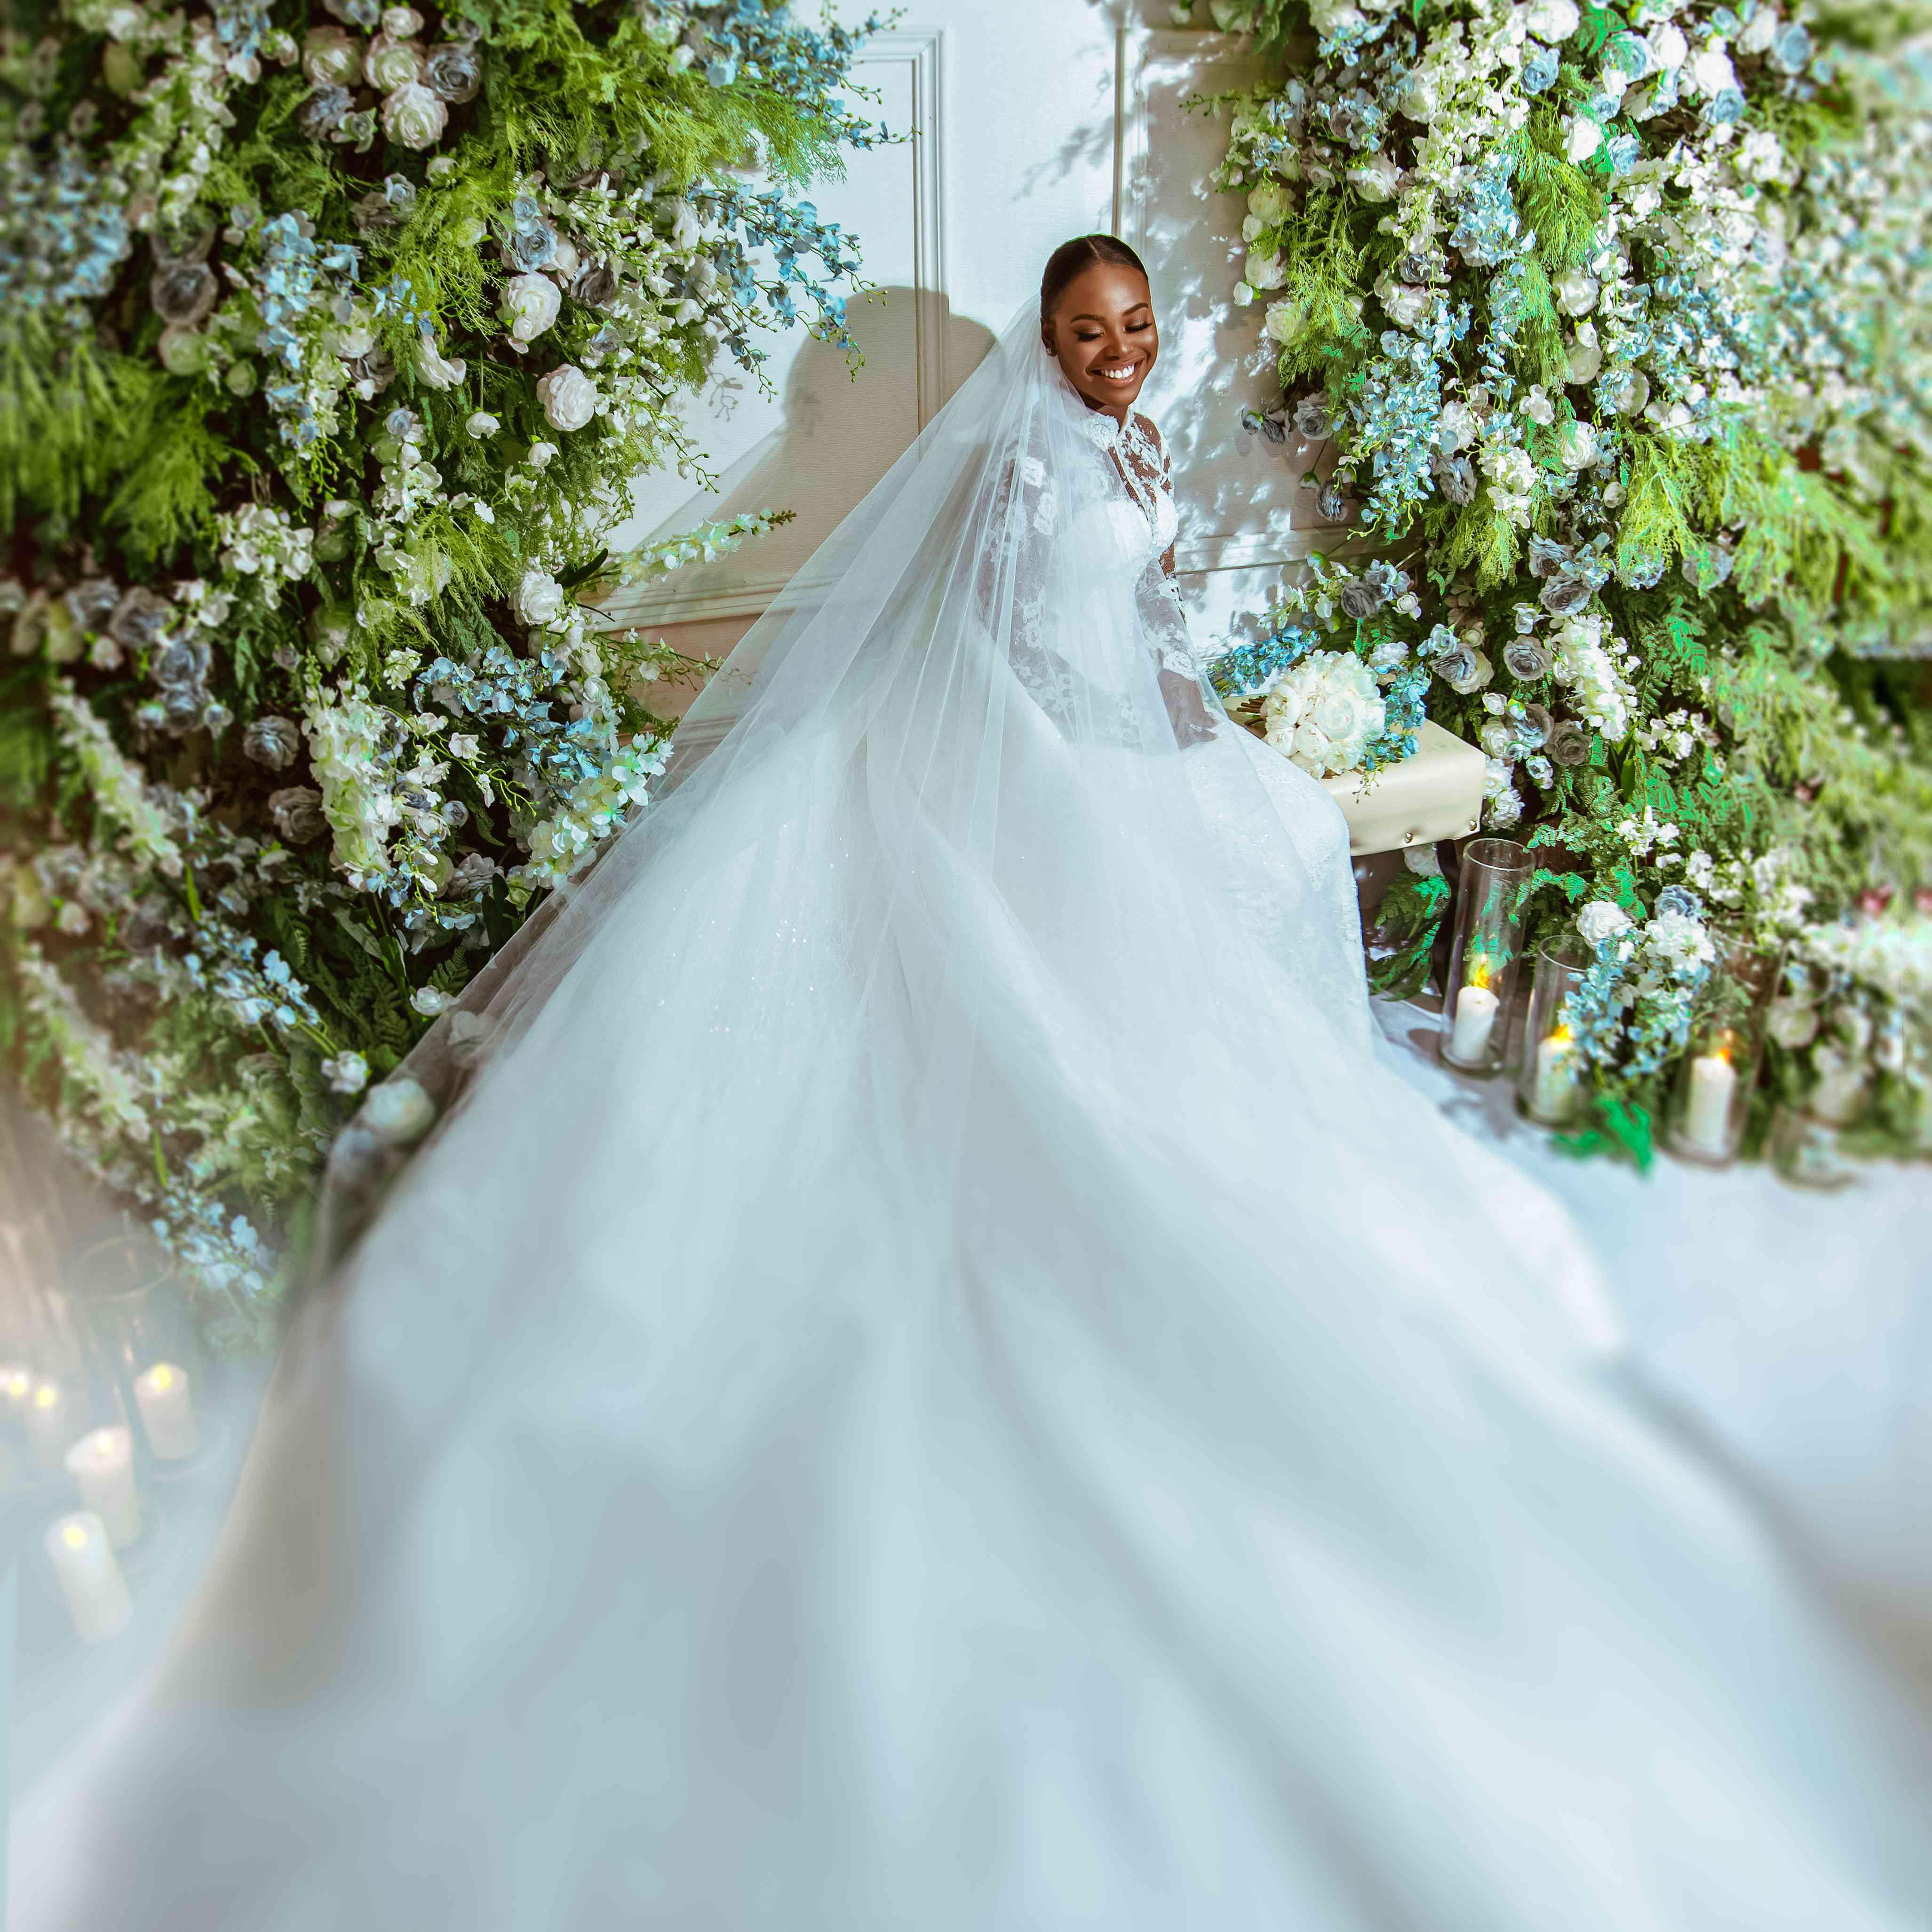 18 Black Wedding Dress Designers to Know